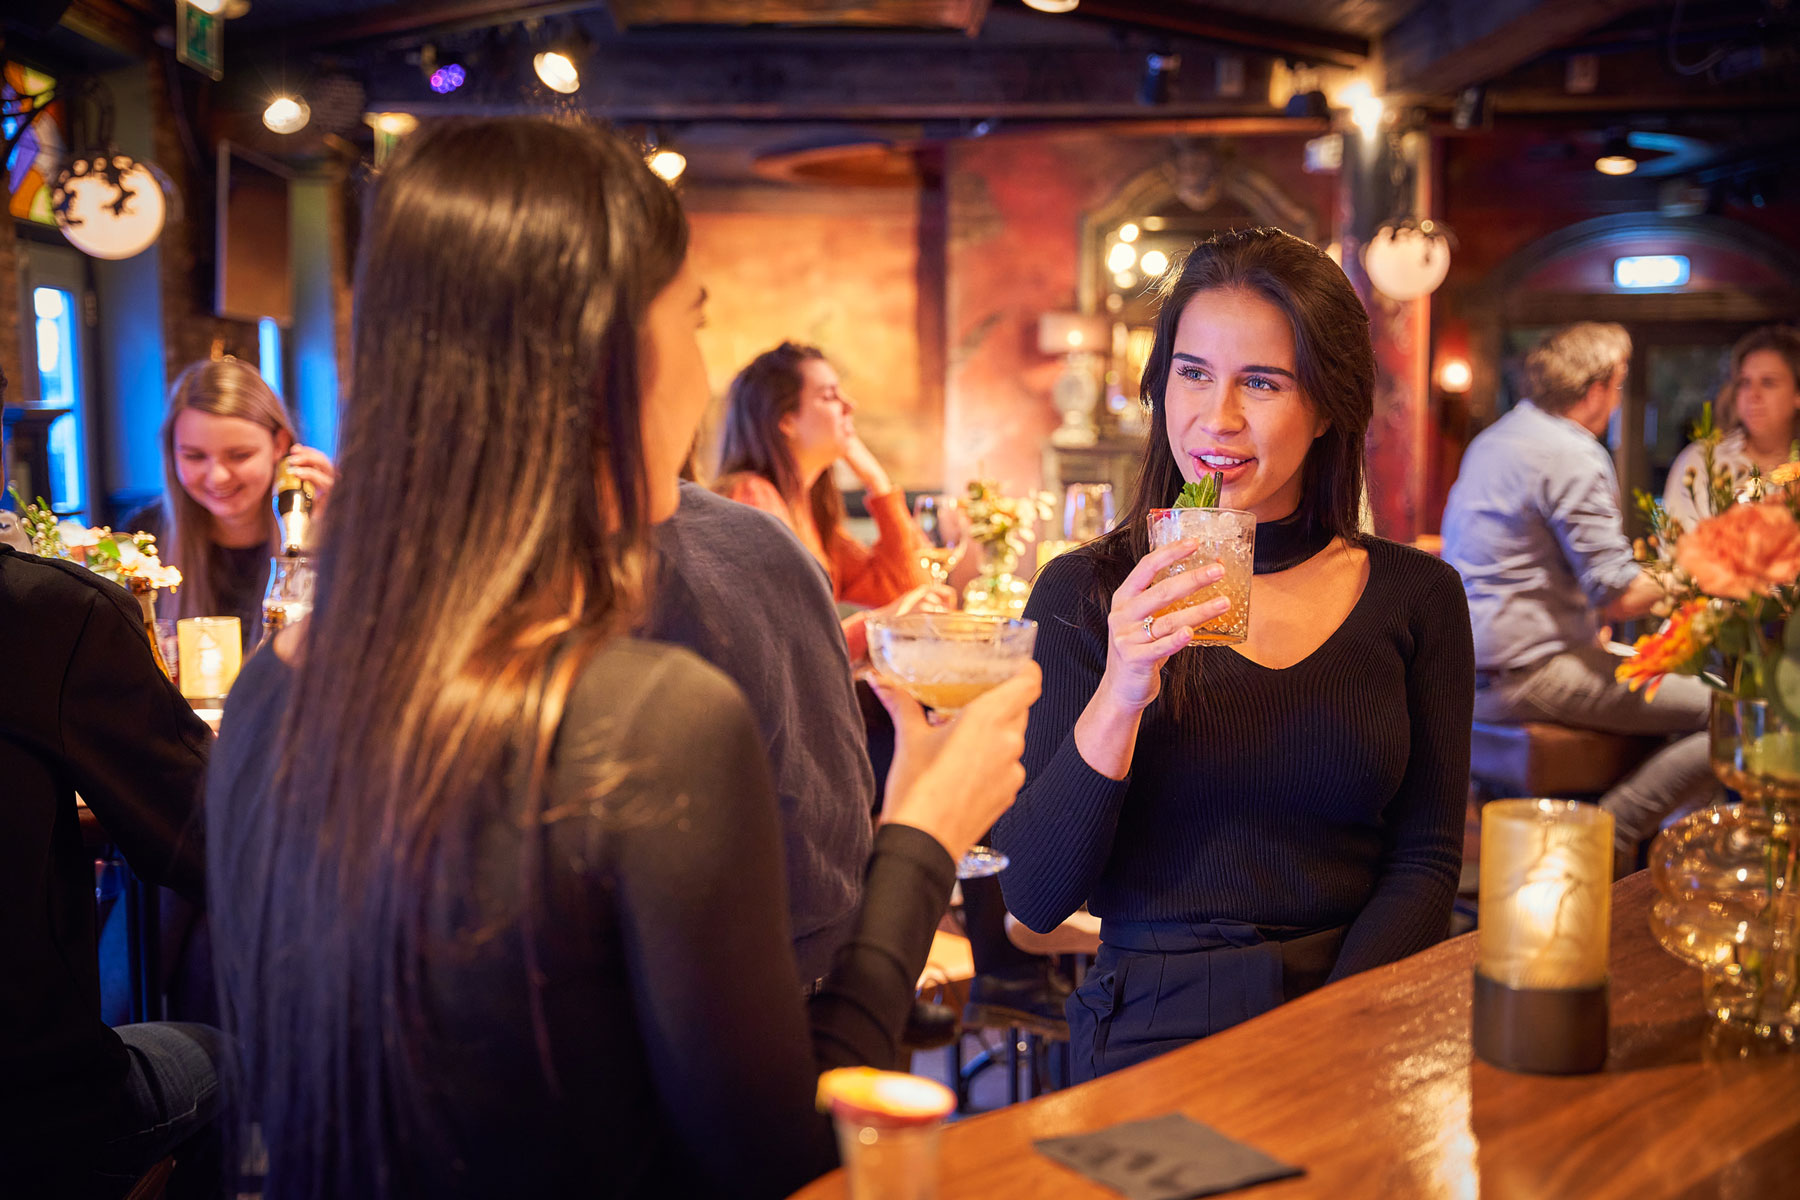 Vrouwen met drankje in grand café Merlijn